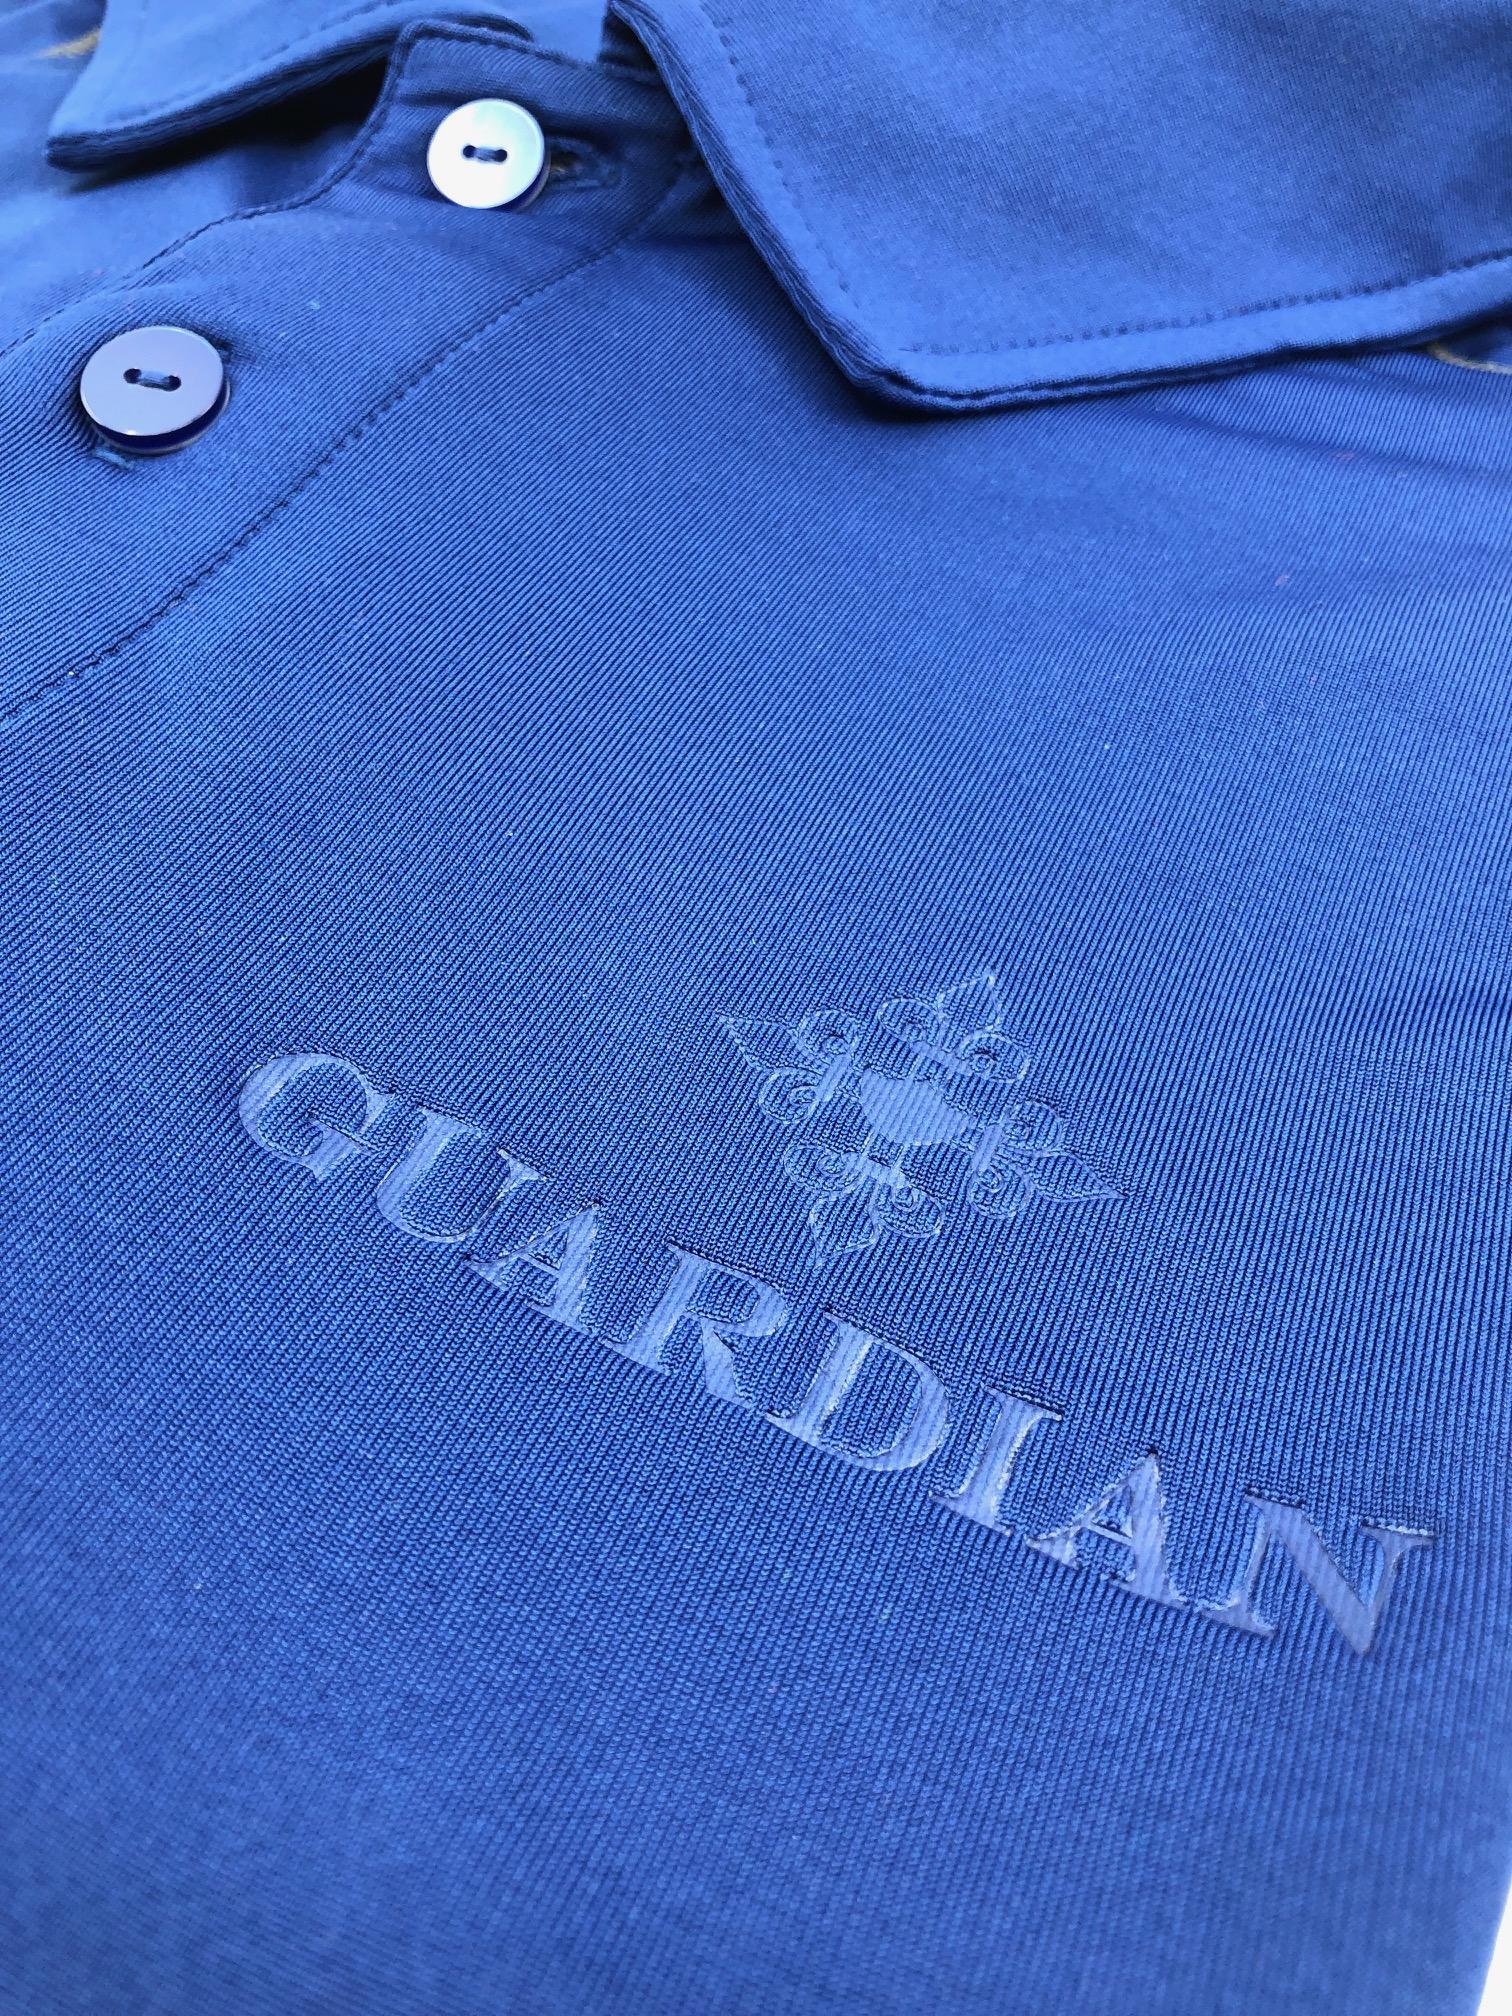 logounltd_laser_etching_embroidery_screen_printing_apparel_uniform_custom_tshirts_t_shirt_kirkland_bellevue_seattle_redmond_woodinville_branded_merchandise_promotional_products_logo_unltd_guardian_cellars (3).jpg